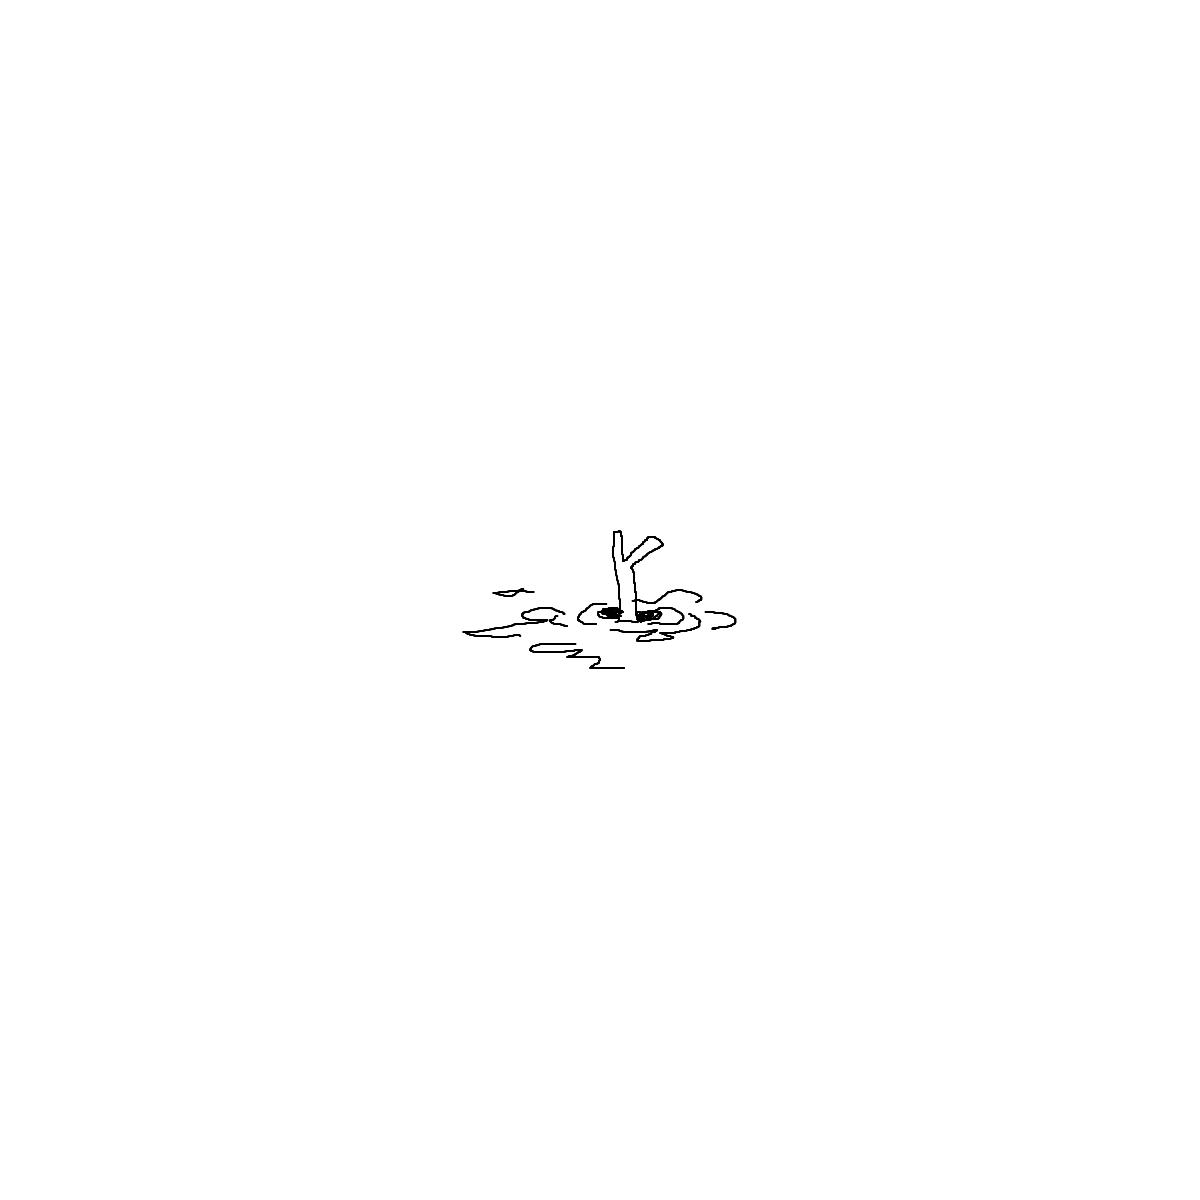 BAAAM drawing#22137 lat:78.4192428588867200lng: -4.4745569229125980